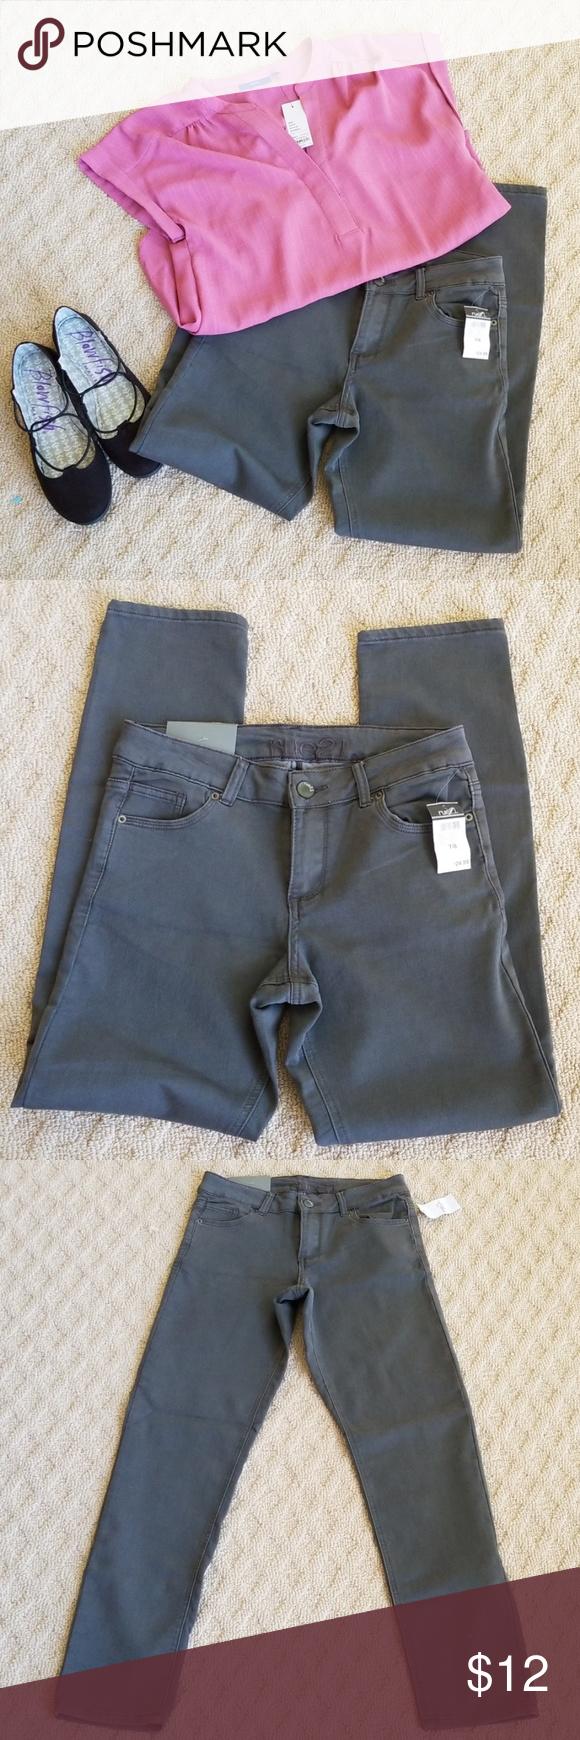 Rue 21 Freedom Flex Gray Jean Mid Rise 7 8 Regular Fashion Grey Jeans Clothes Design